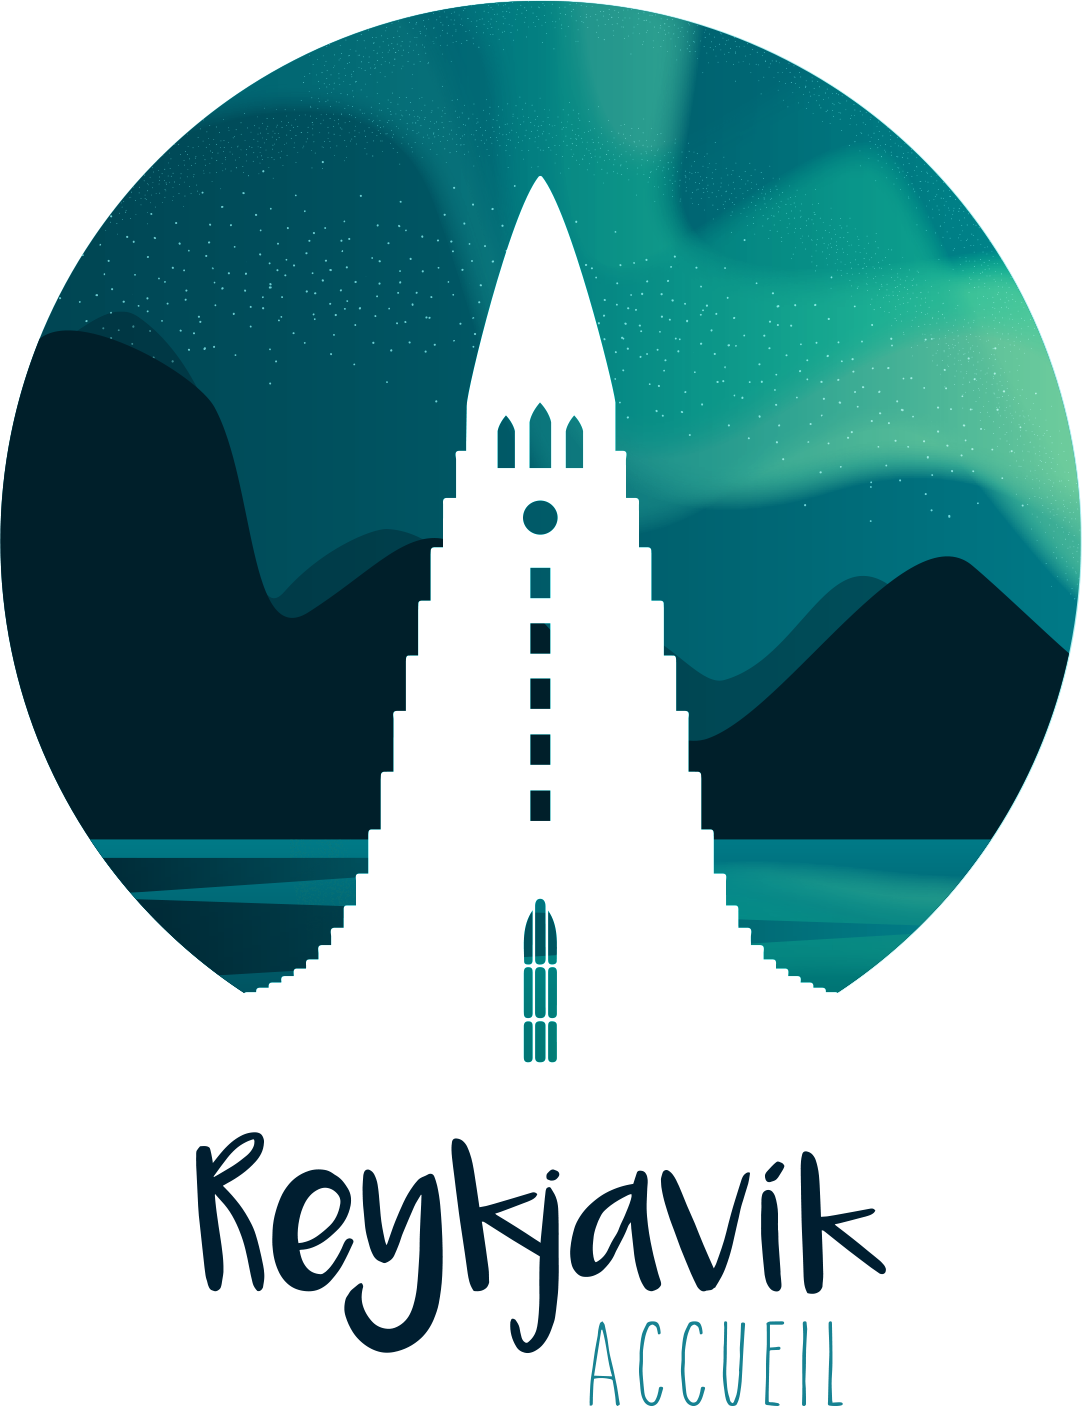 Reykjavik Accueil